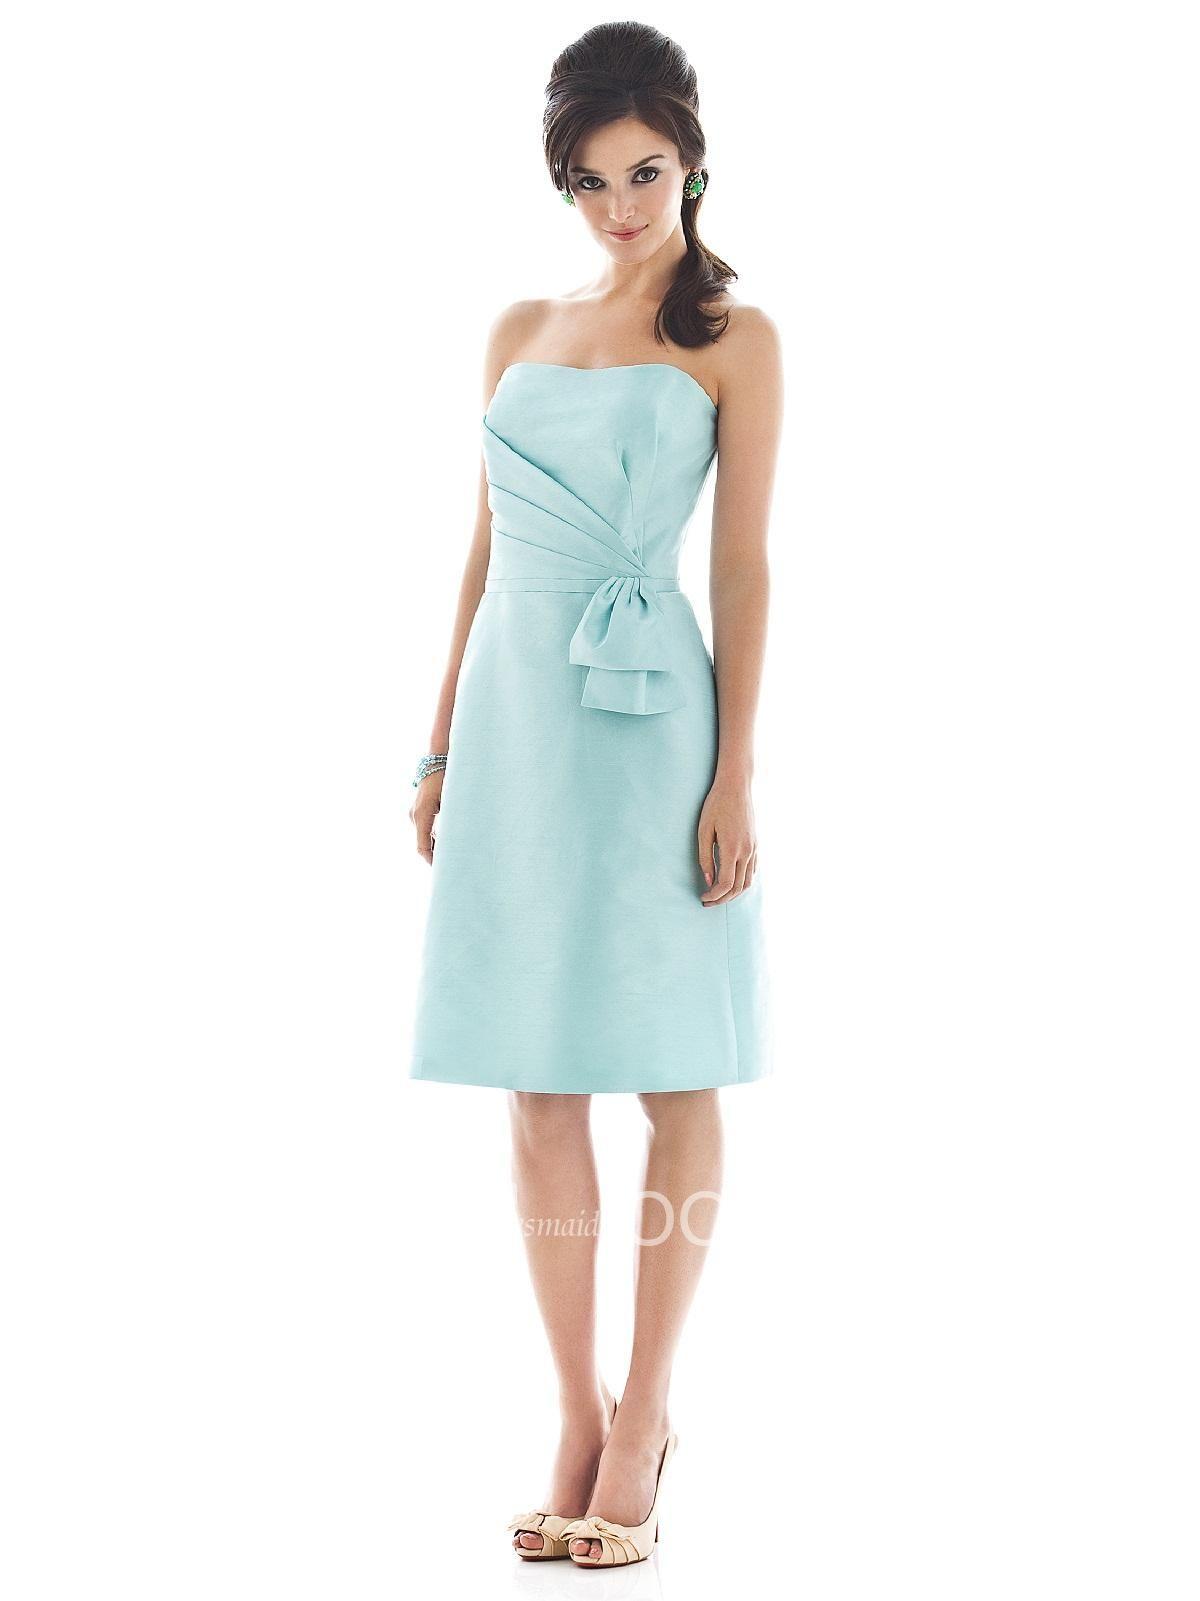 strapless light blue bridesmaid dress knee length a line cocktail